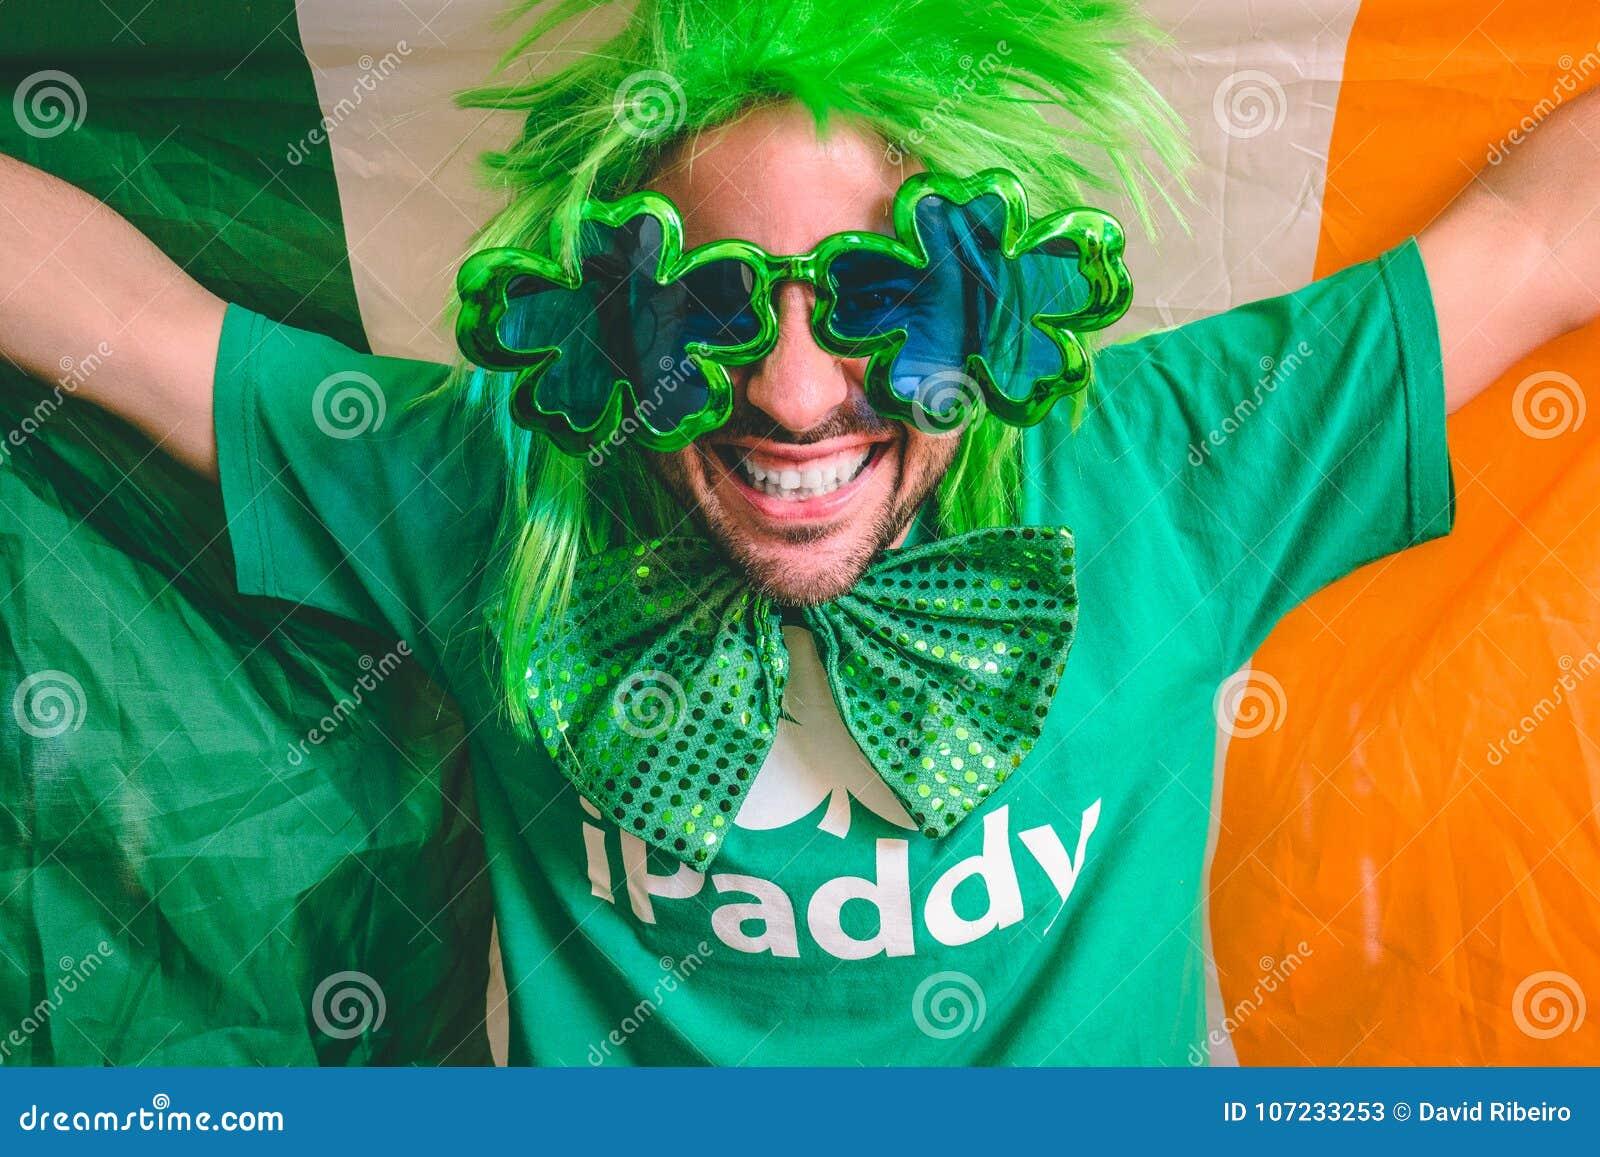 Portrait of a man holding the Irish flag